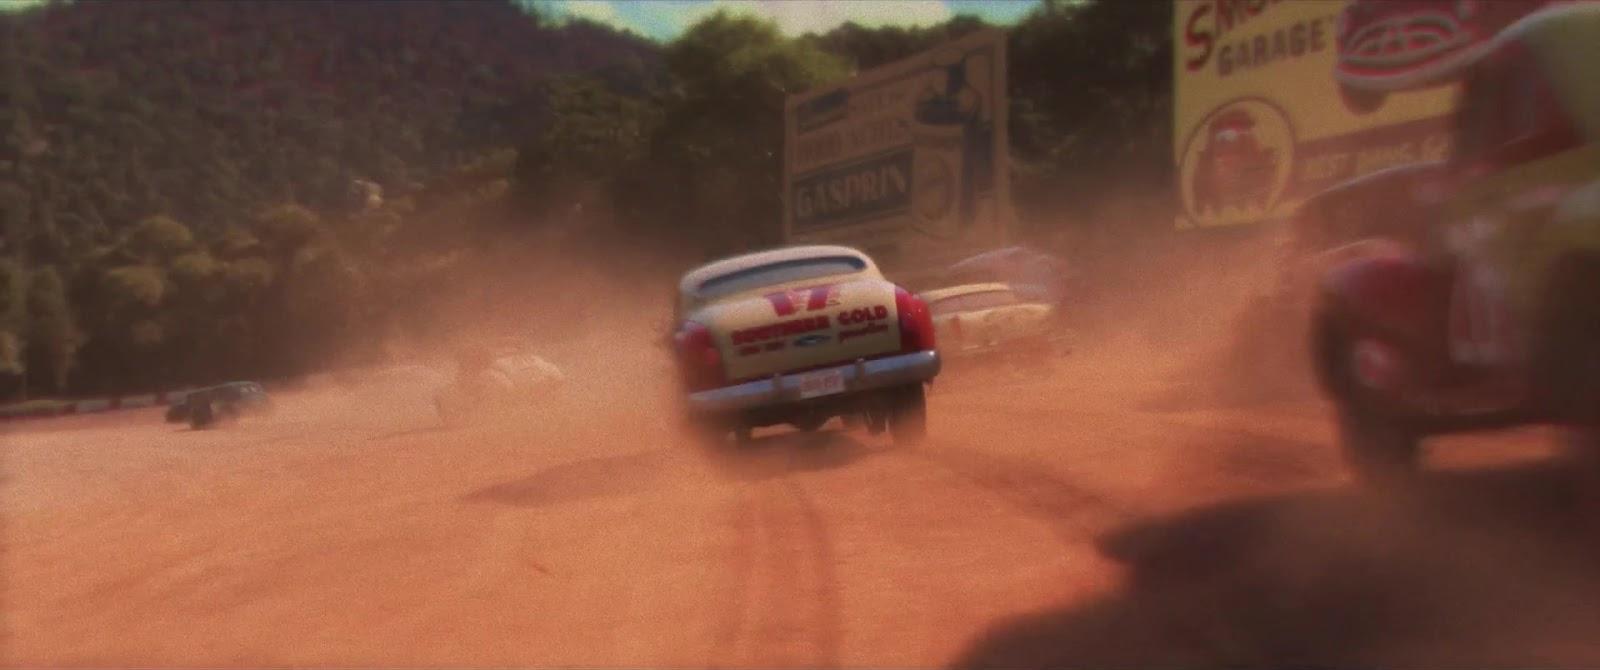 pixar cars 3 jet robinson